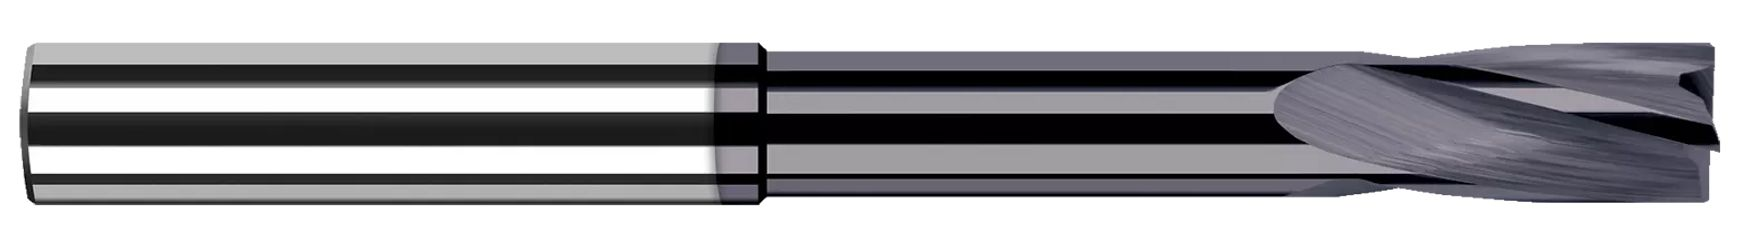 Counterbores - Flat Bottom - Long Reach